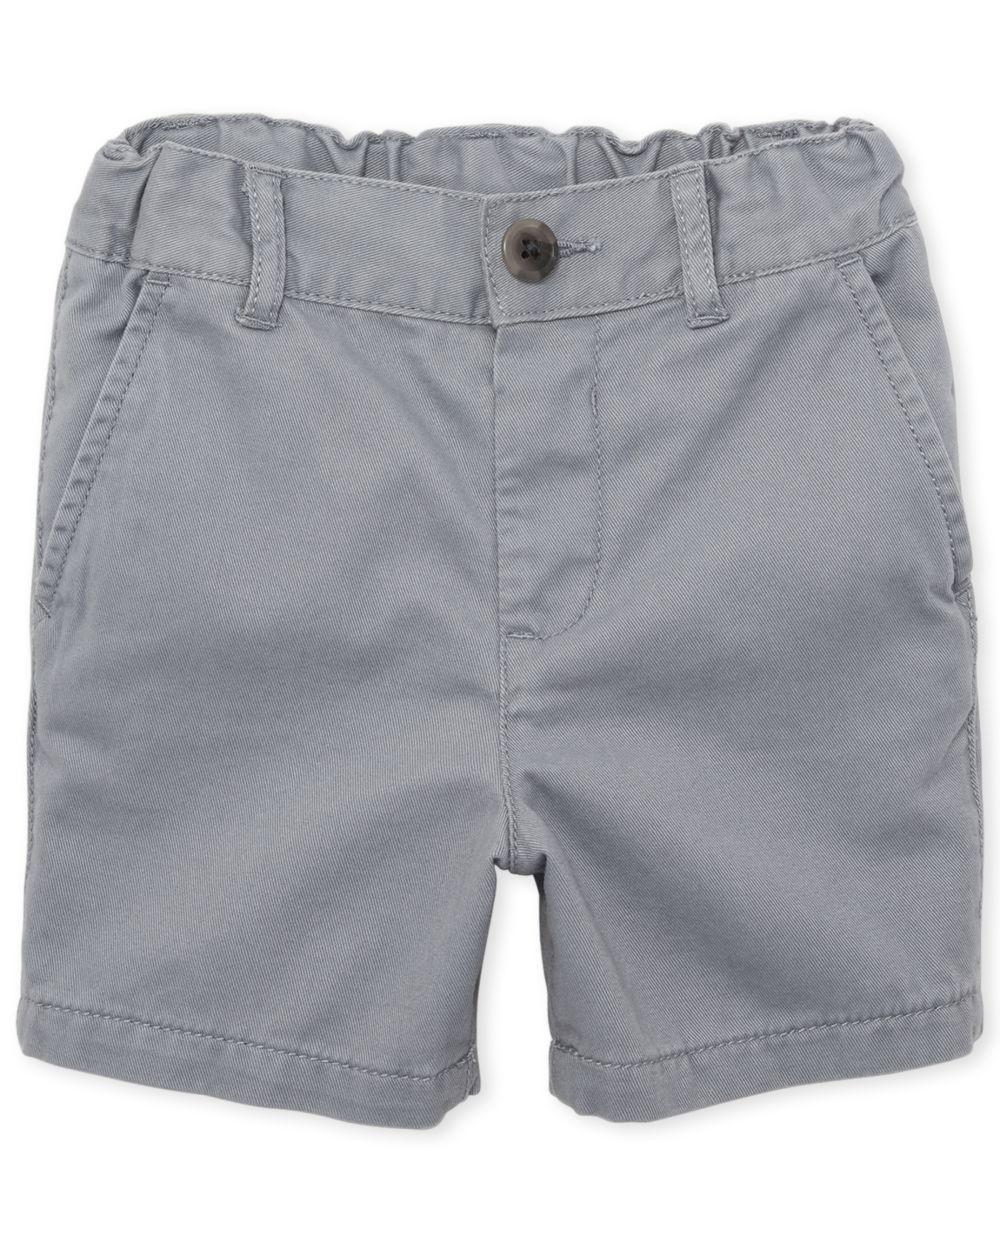 Toddler Boys Uniform Chino Shorts